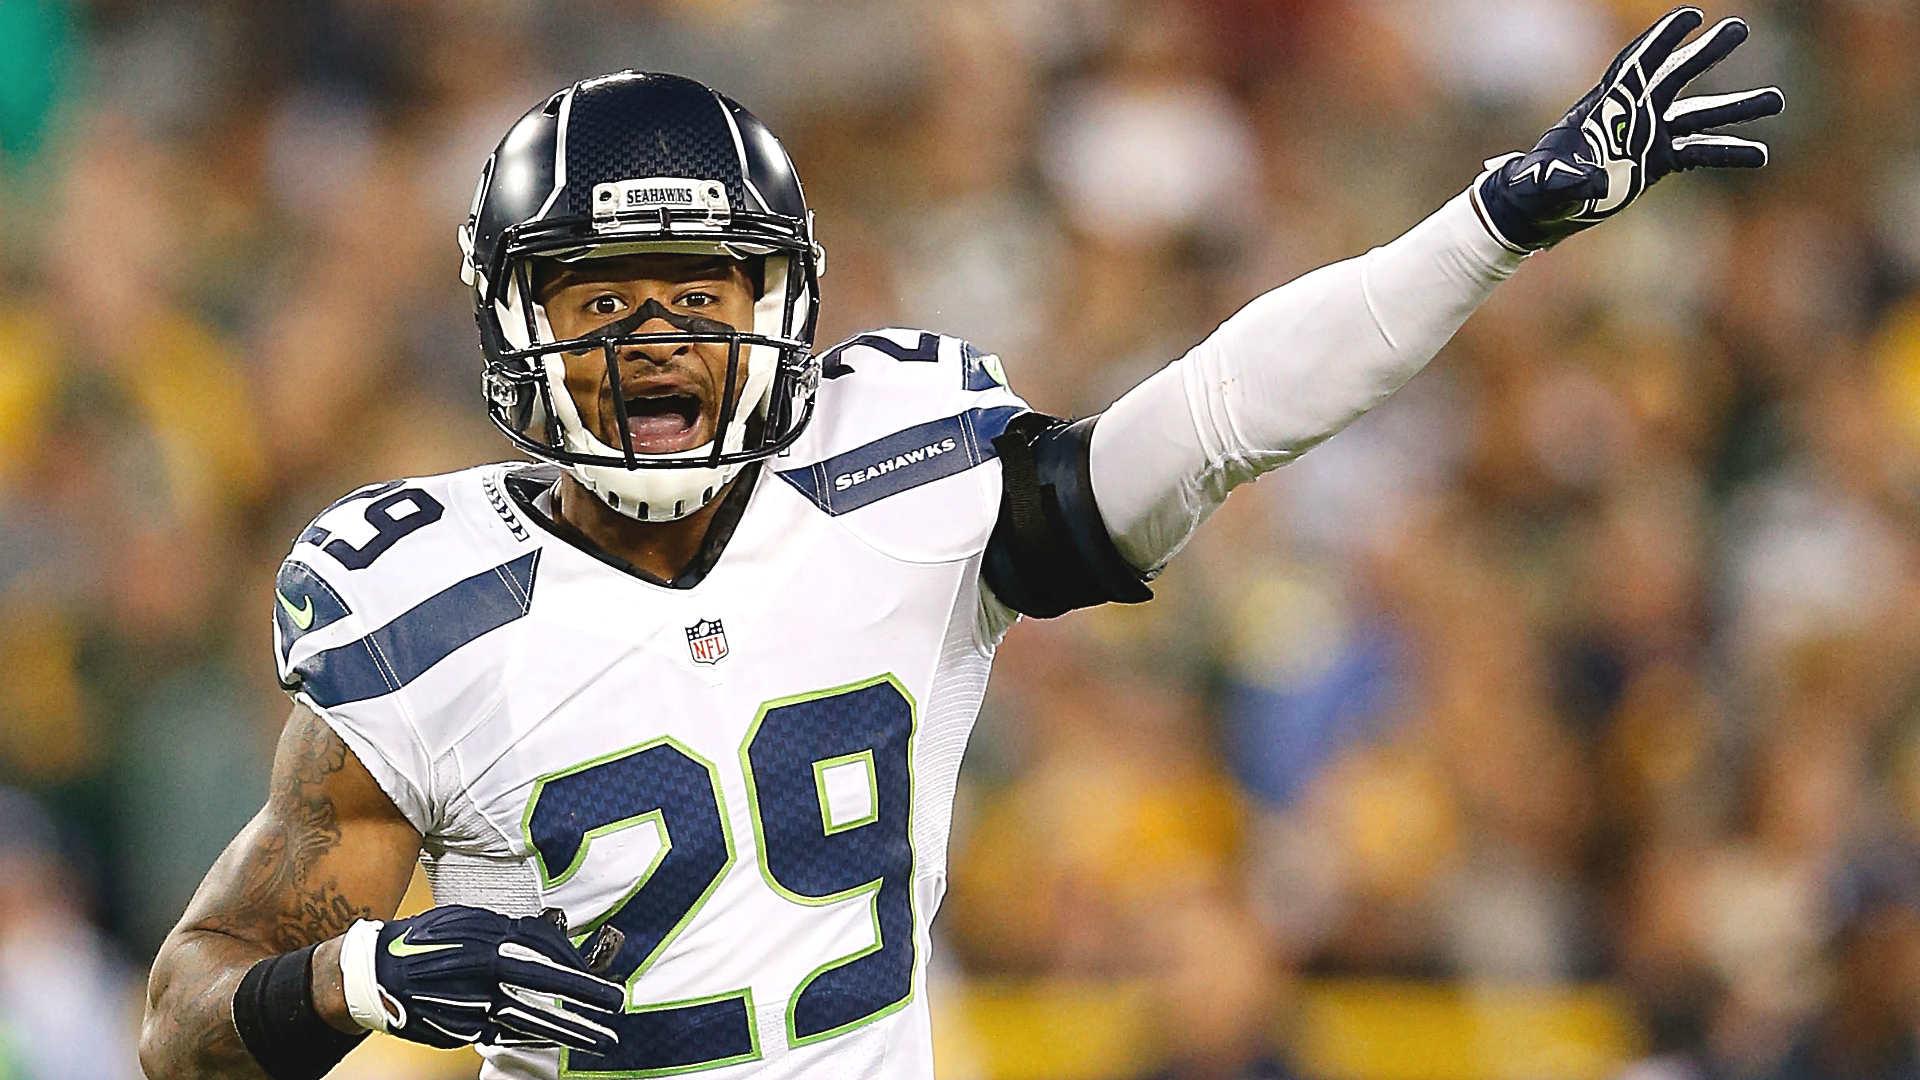 Seahawks Defense Finally Records An Interception